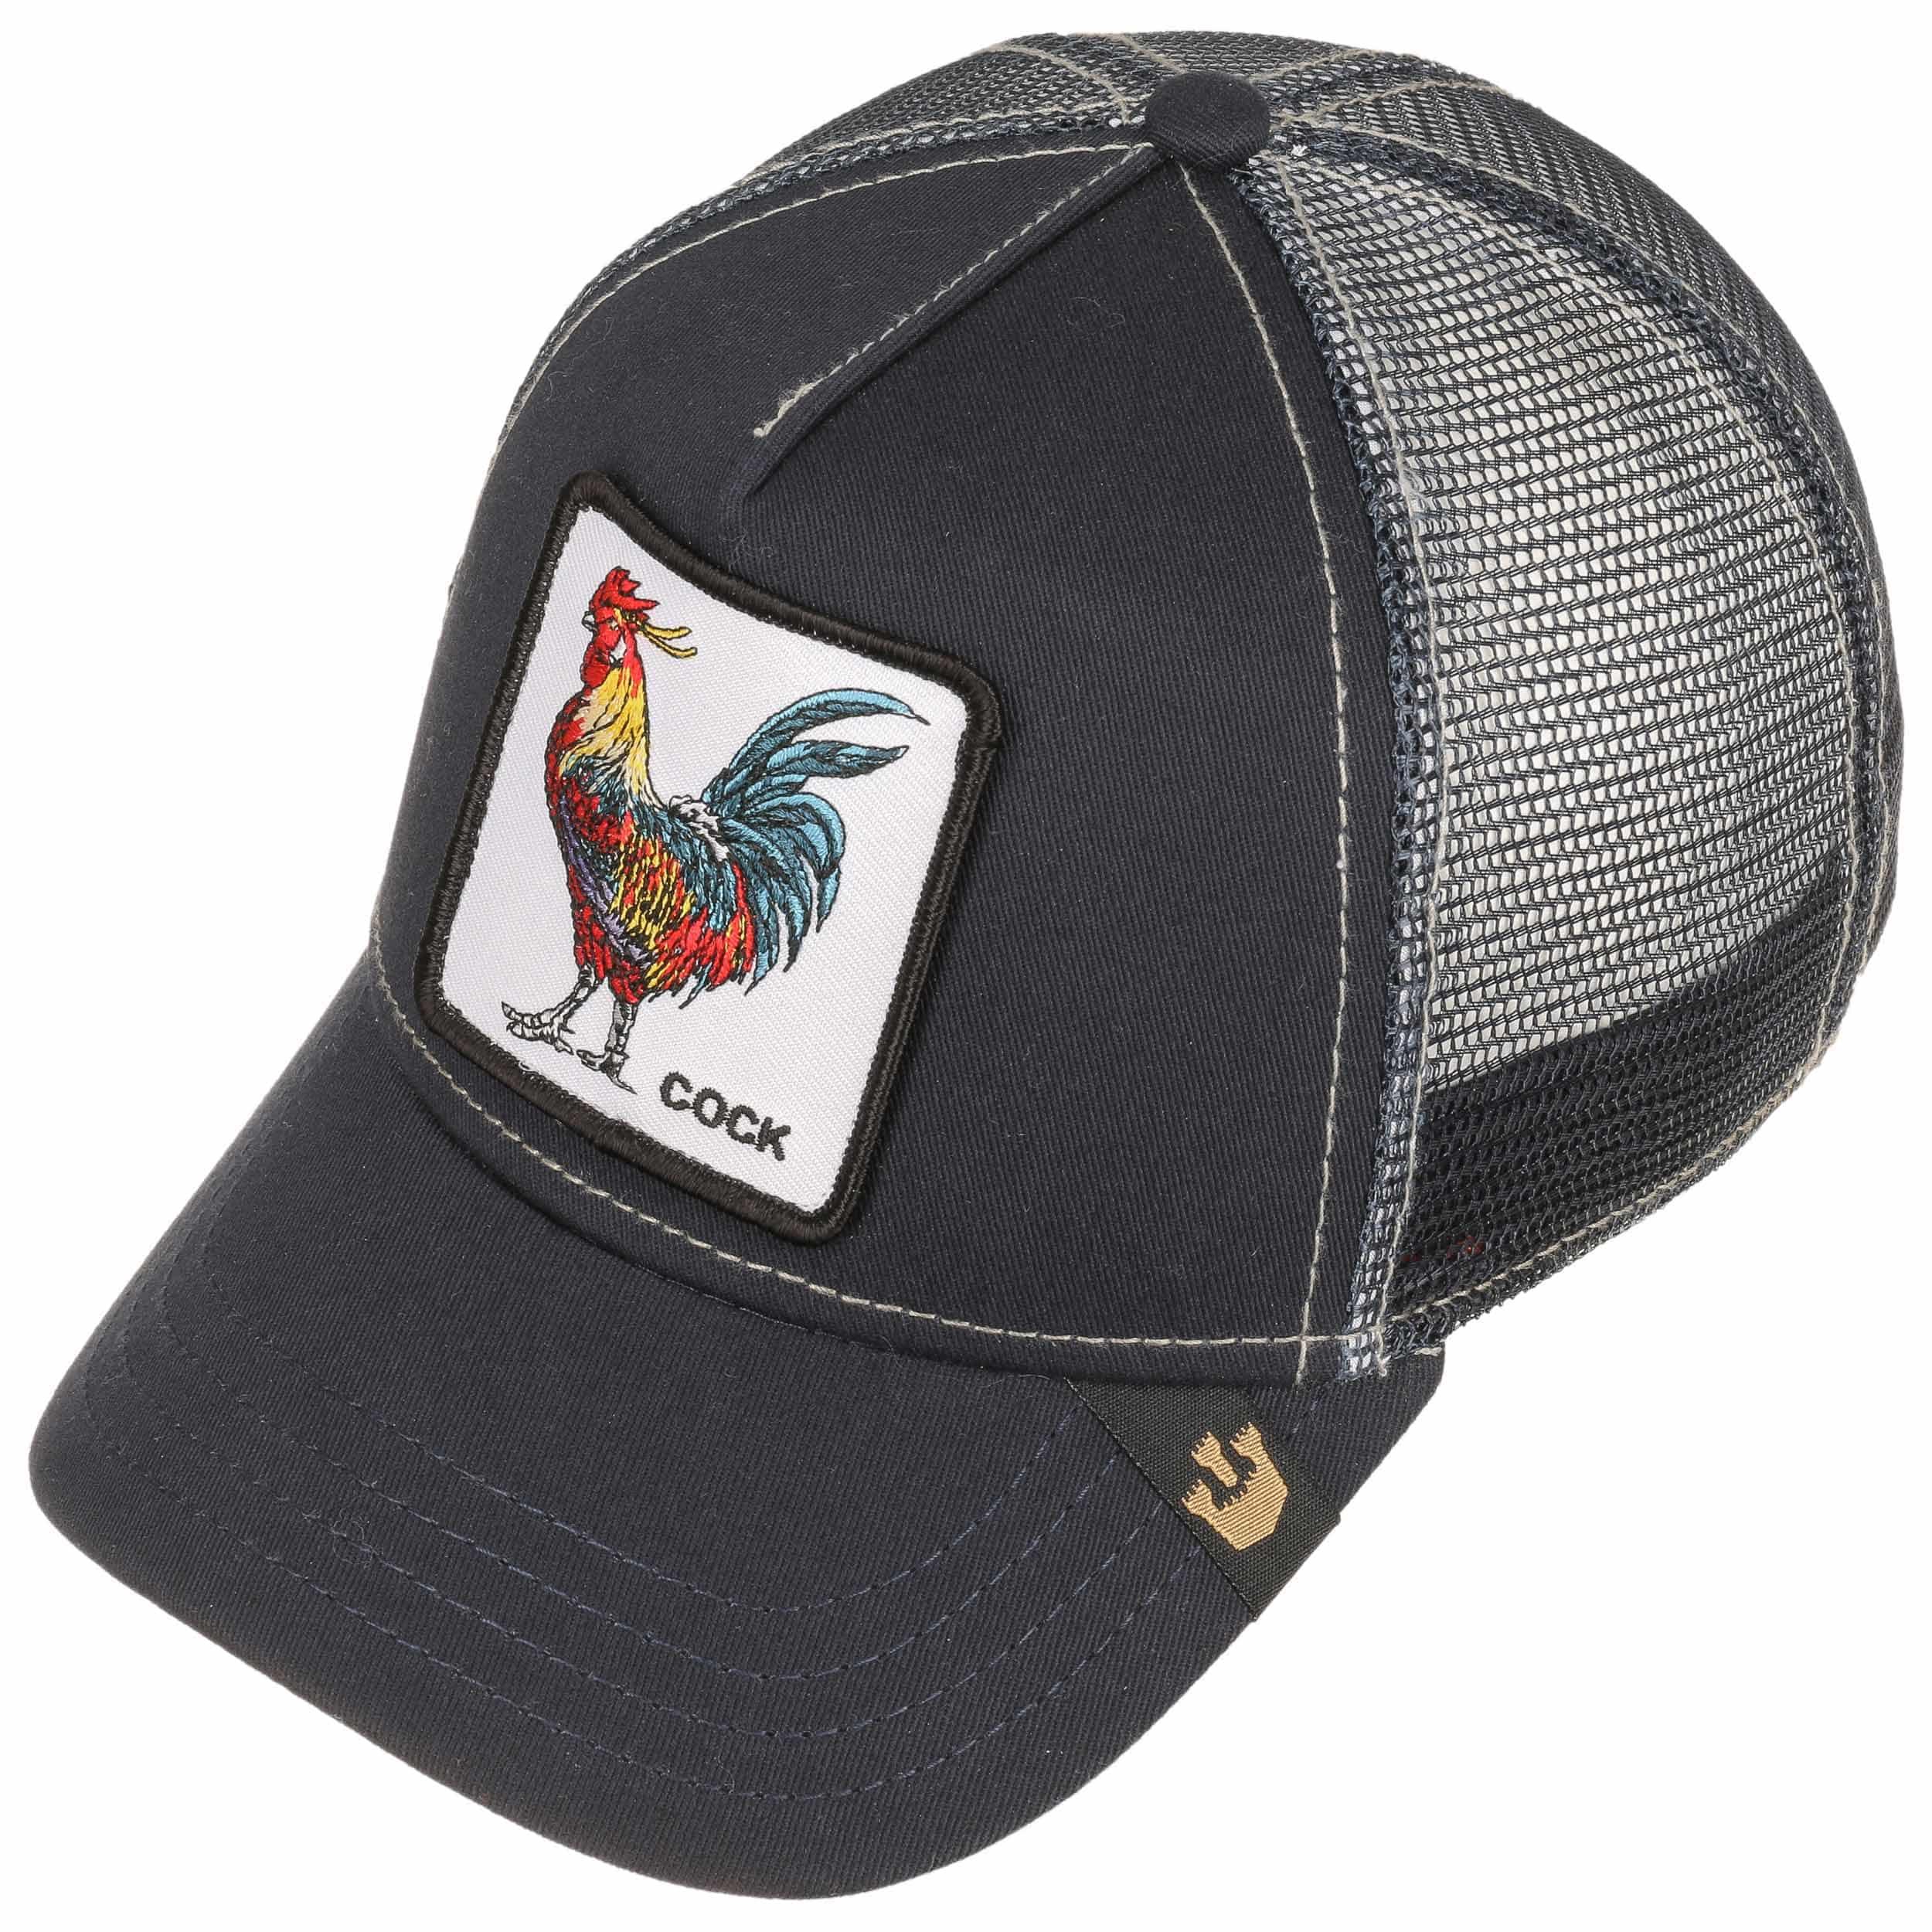 Rooster Trucker Cap by Goorin Bros. 07e3e329bac